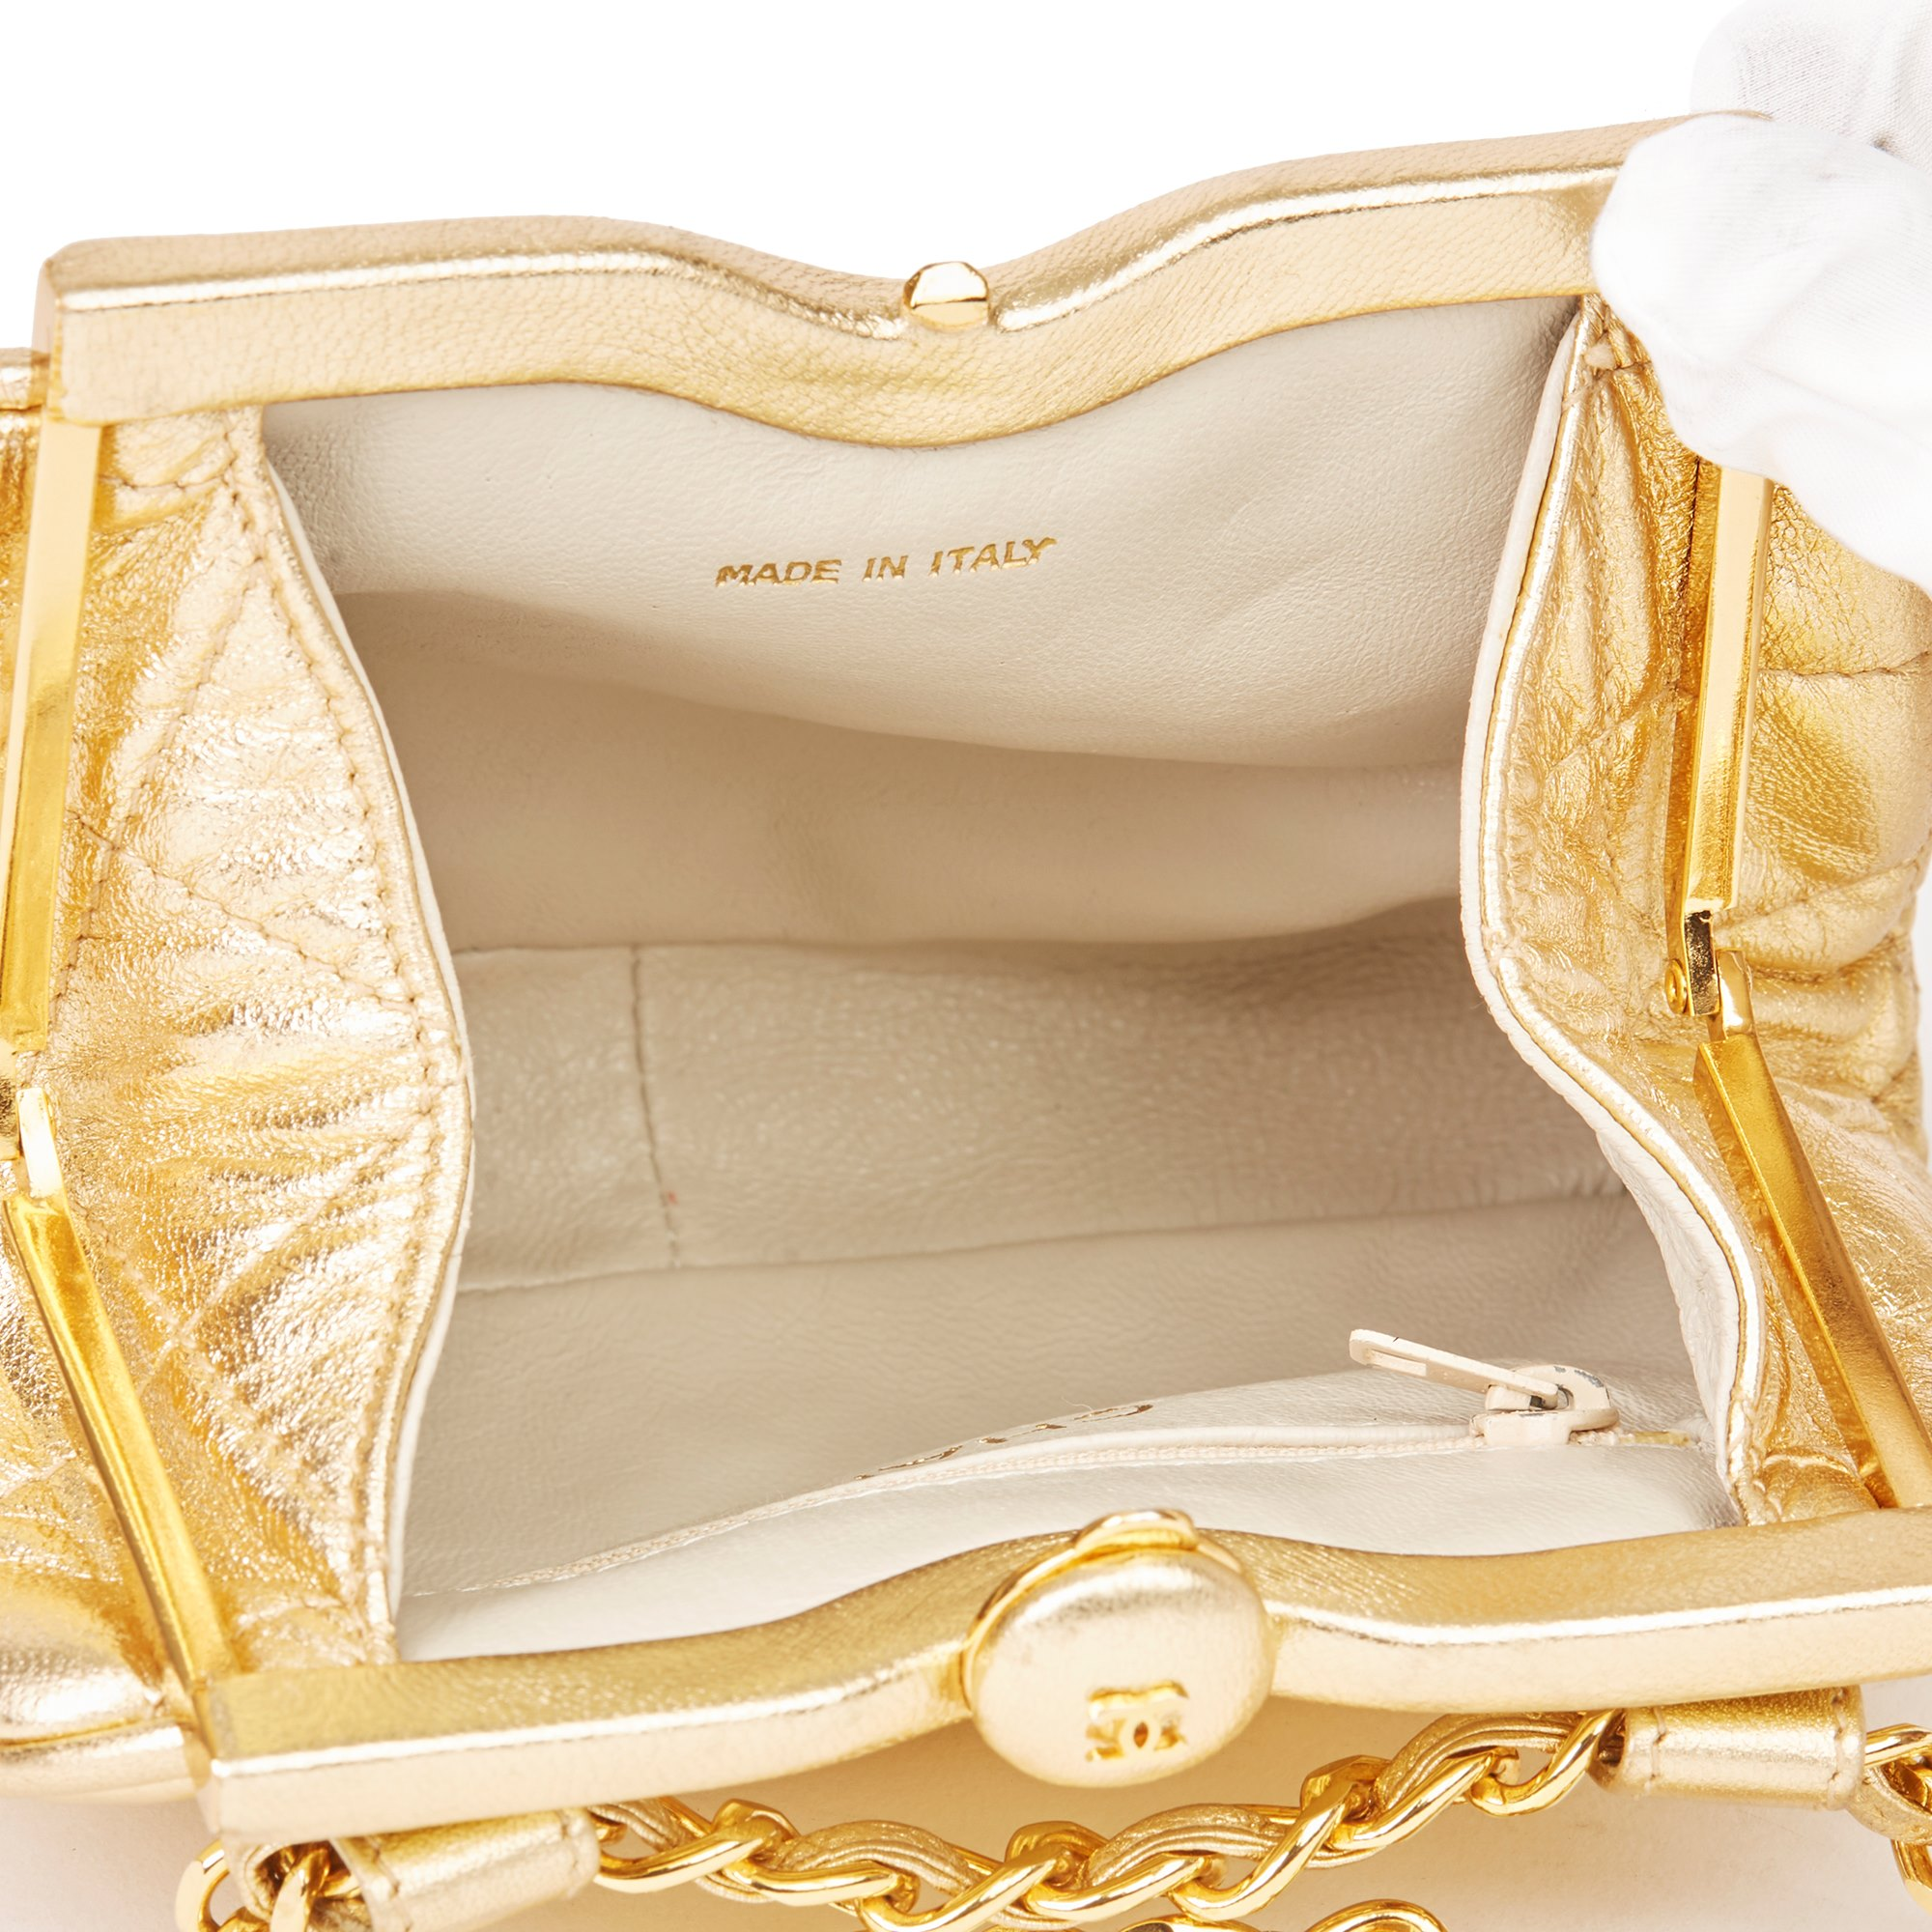 Chanel Gold Quilted Metallic Lambskin Vintage Timeless Belt Bag